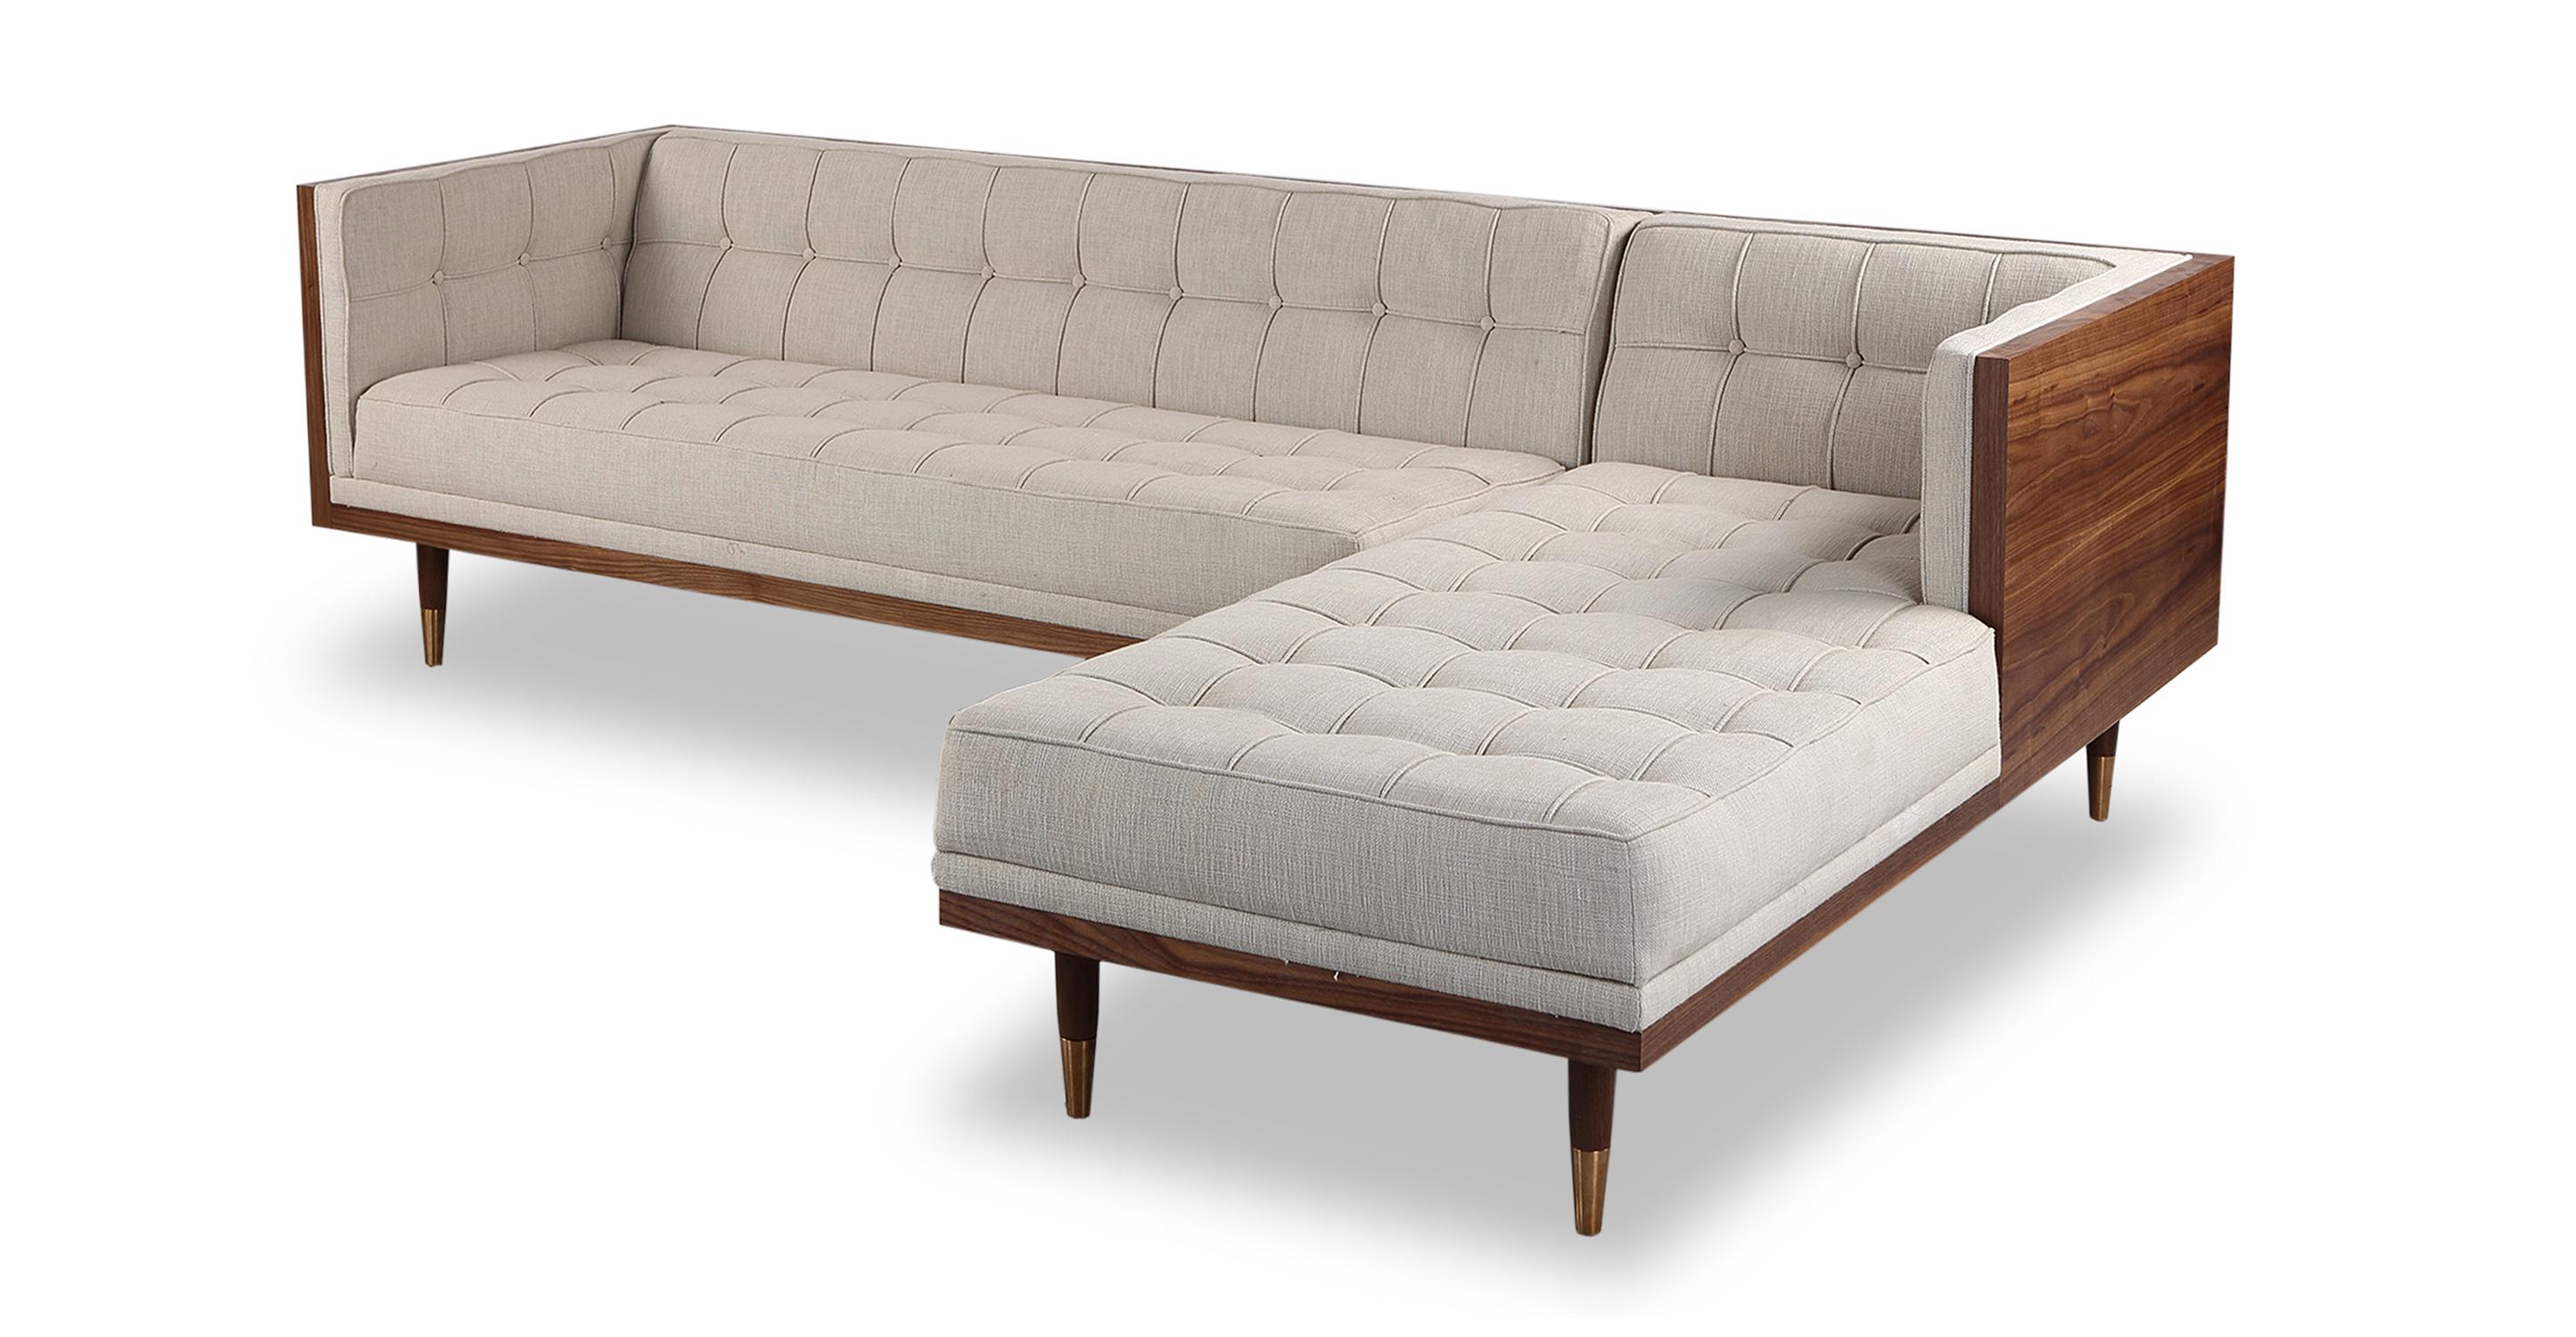 Woodrow Box 100 Fabric Sofa Sectional Right Walnut Urban Hemp Kardiel